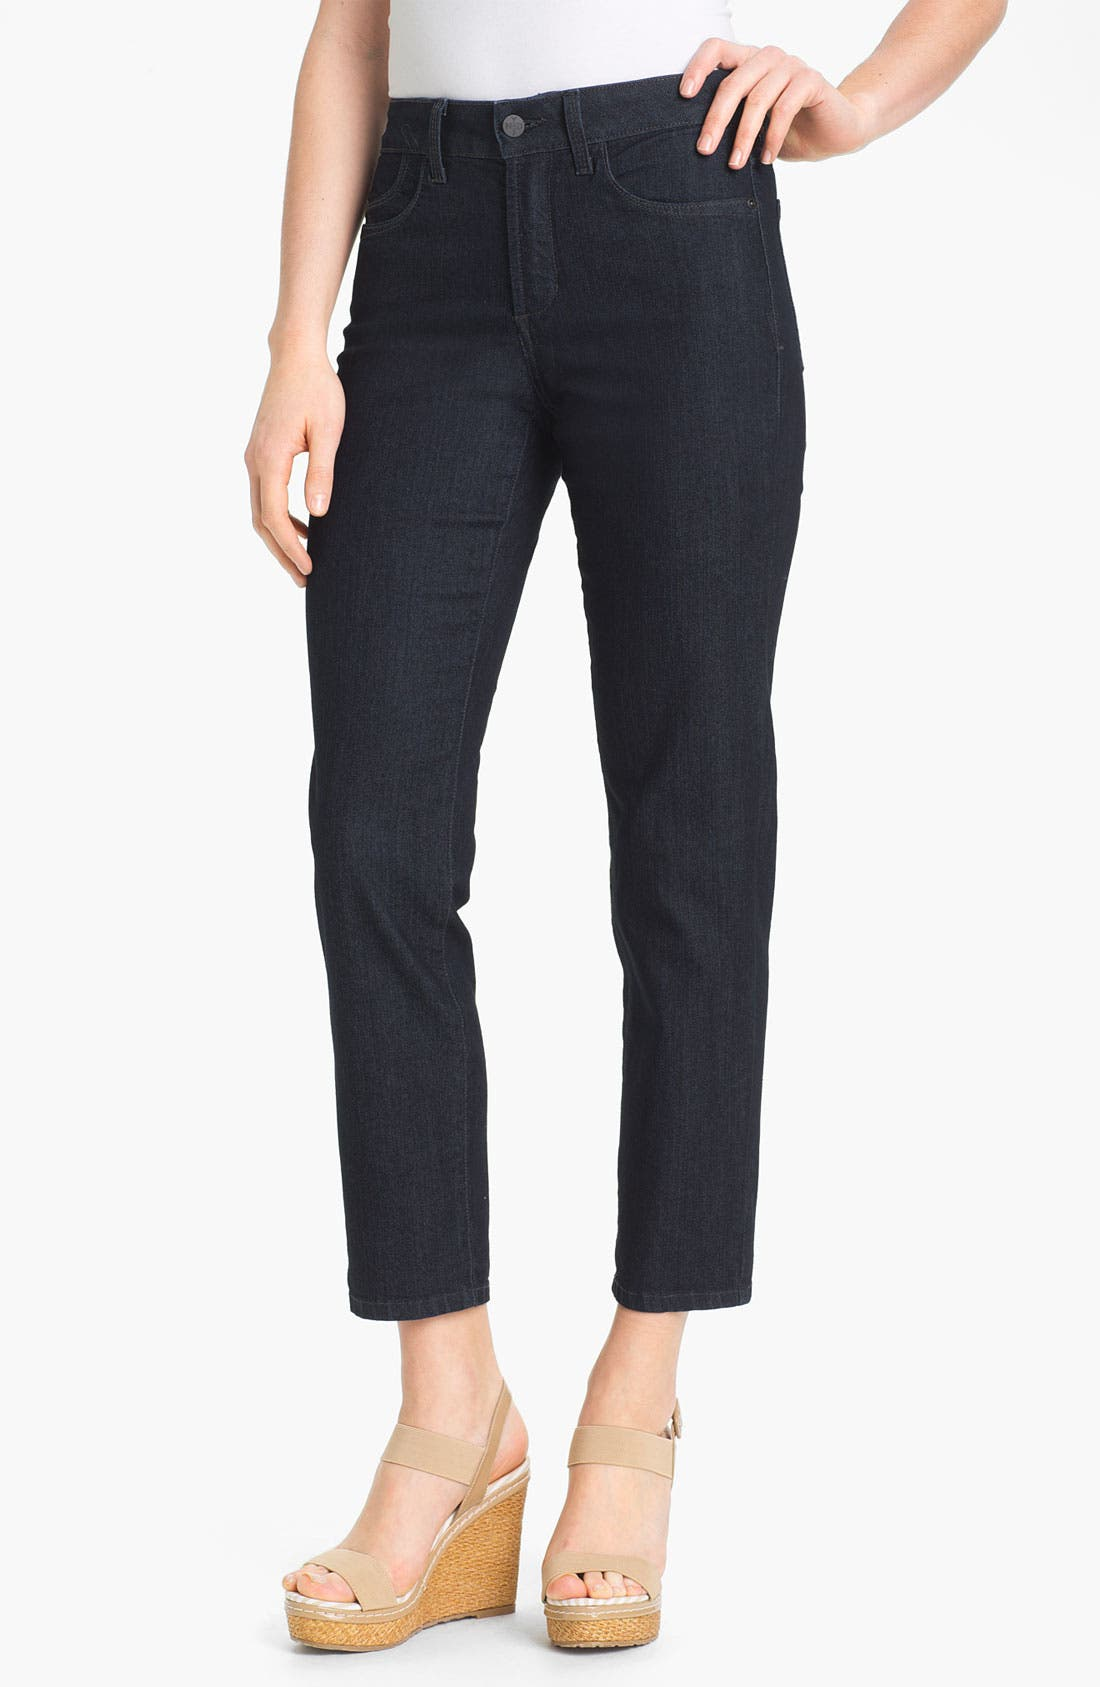 Main Image - NYDJ 'Alisha' Skinny Stretch Ankle Jeans